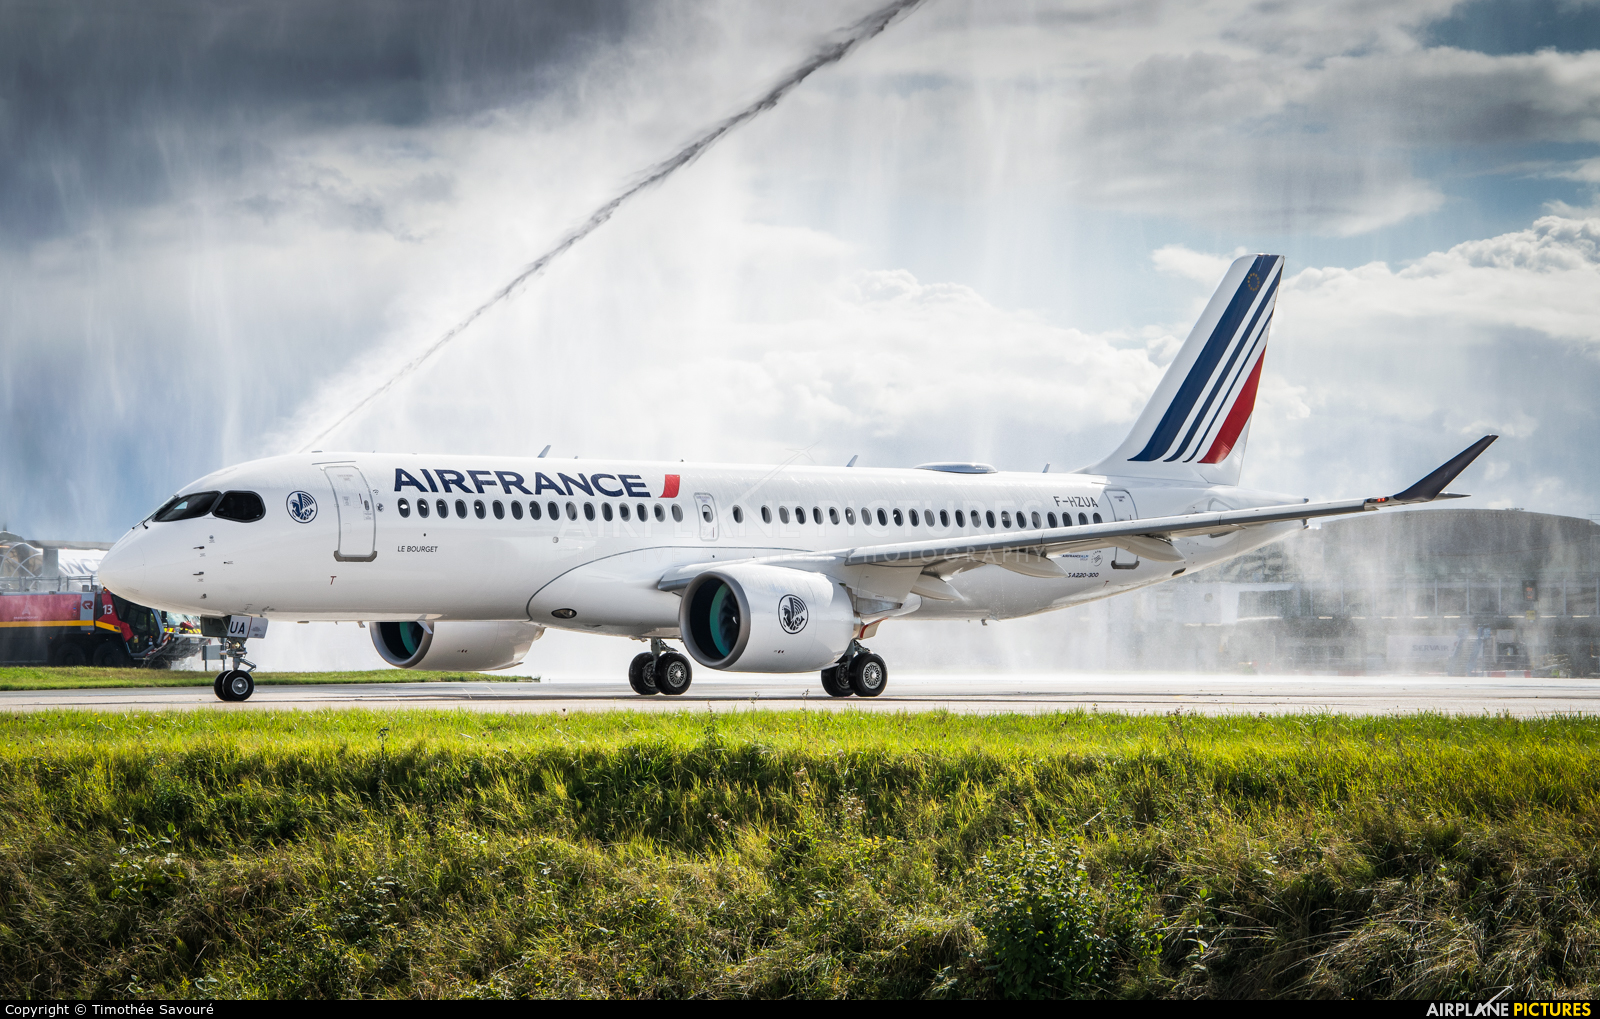 Air France F-HZUA aircraft at Paris - Charles de Gaulle